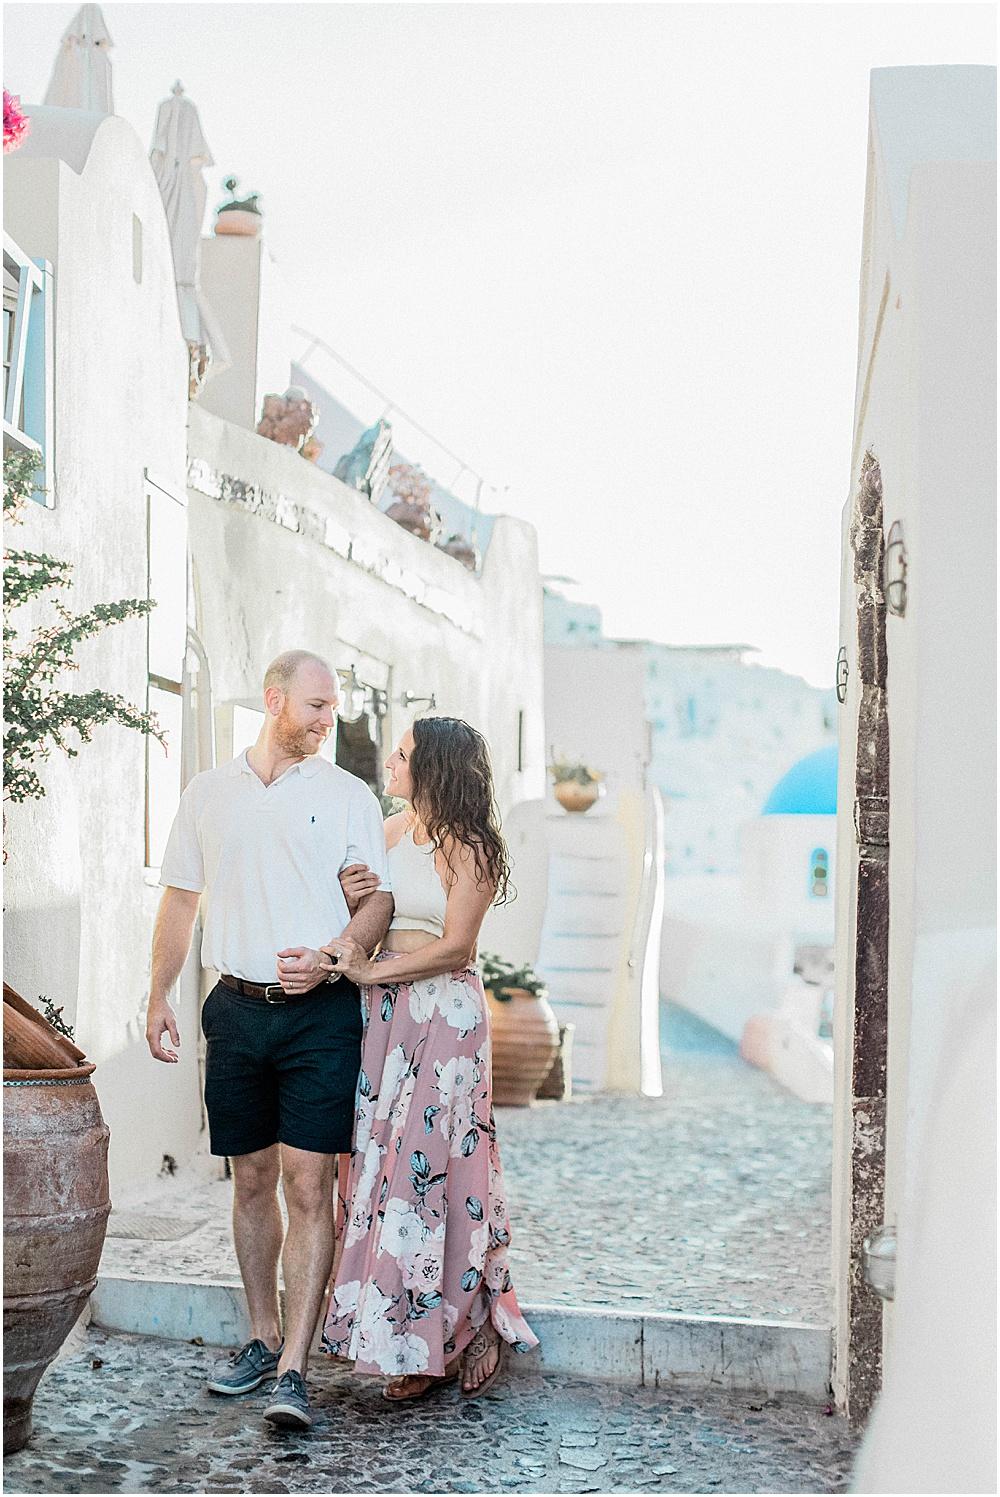 honeymoon_greece_santorini_mykonos_island_ma_boston_wedding_photographer_meredith_jane_photography_photo_0065.jpg